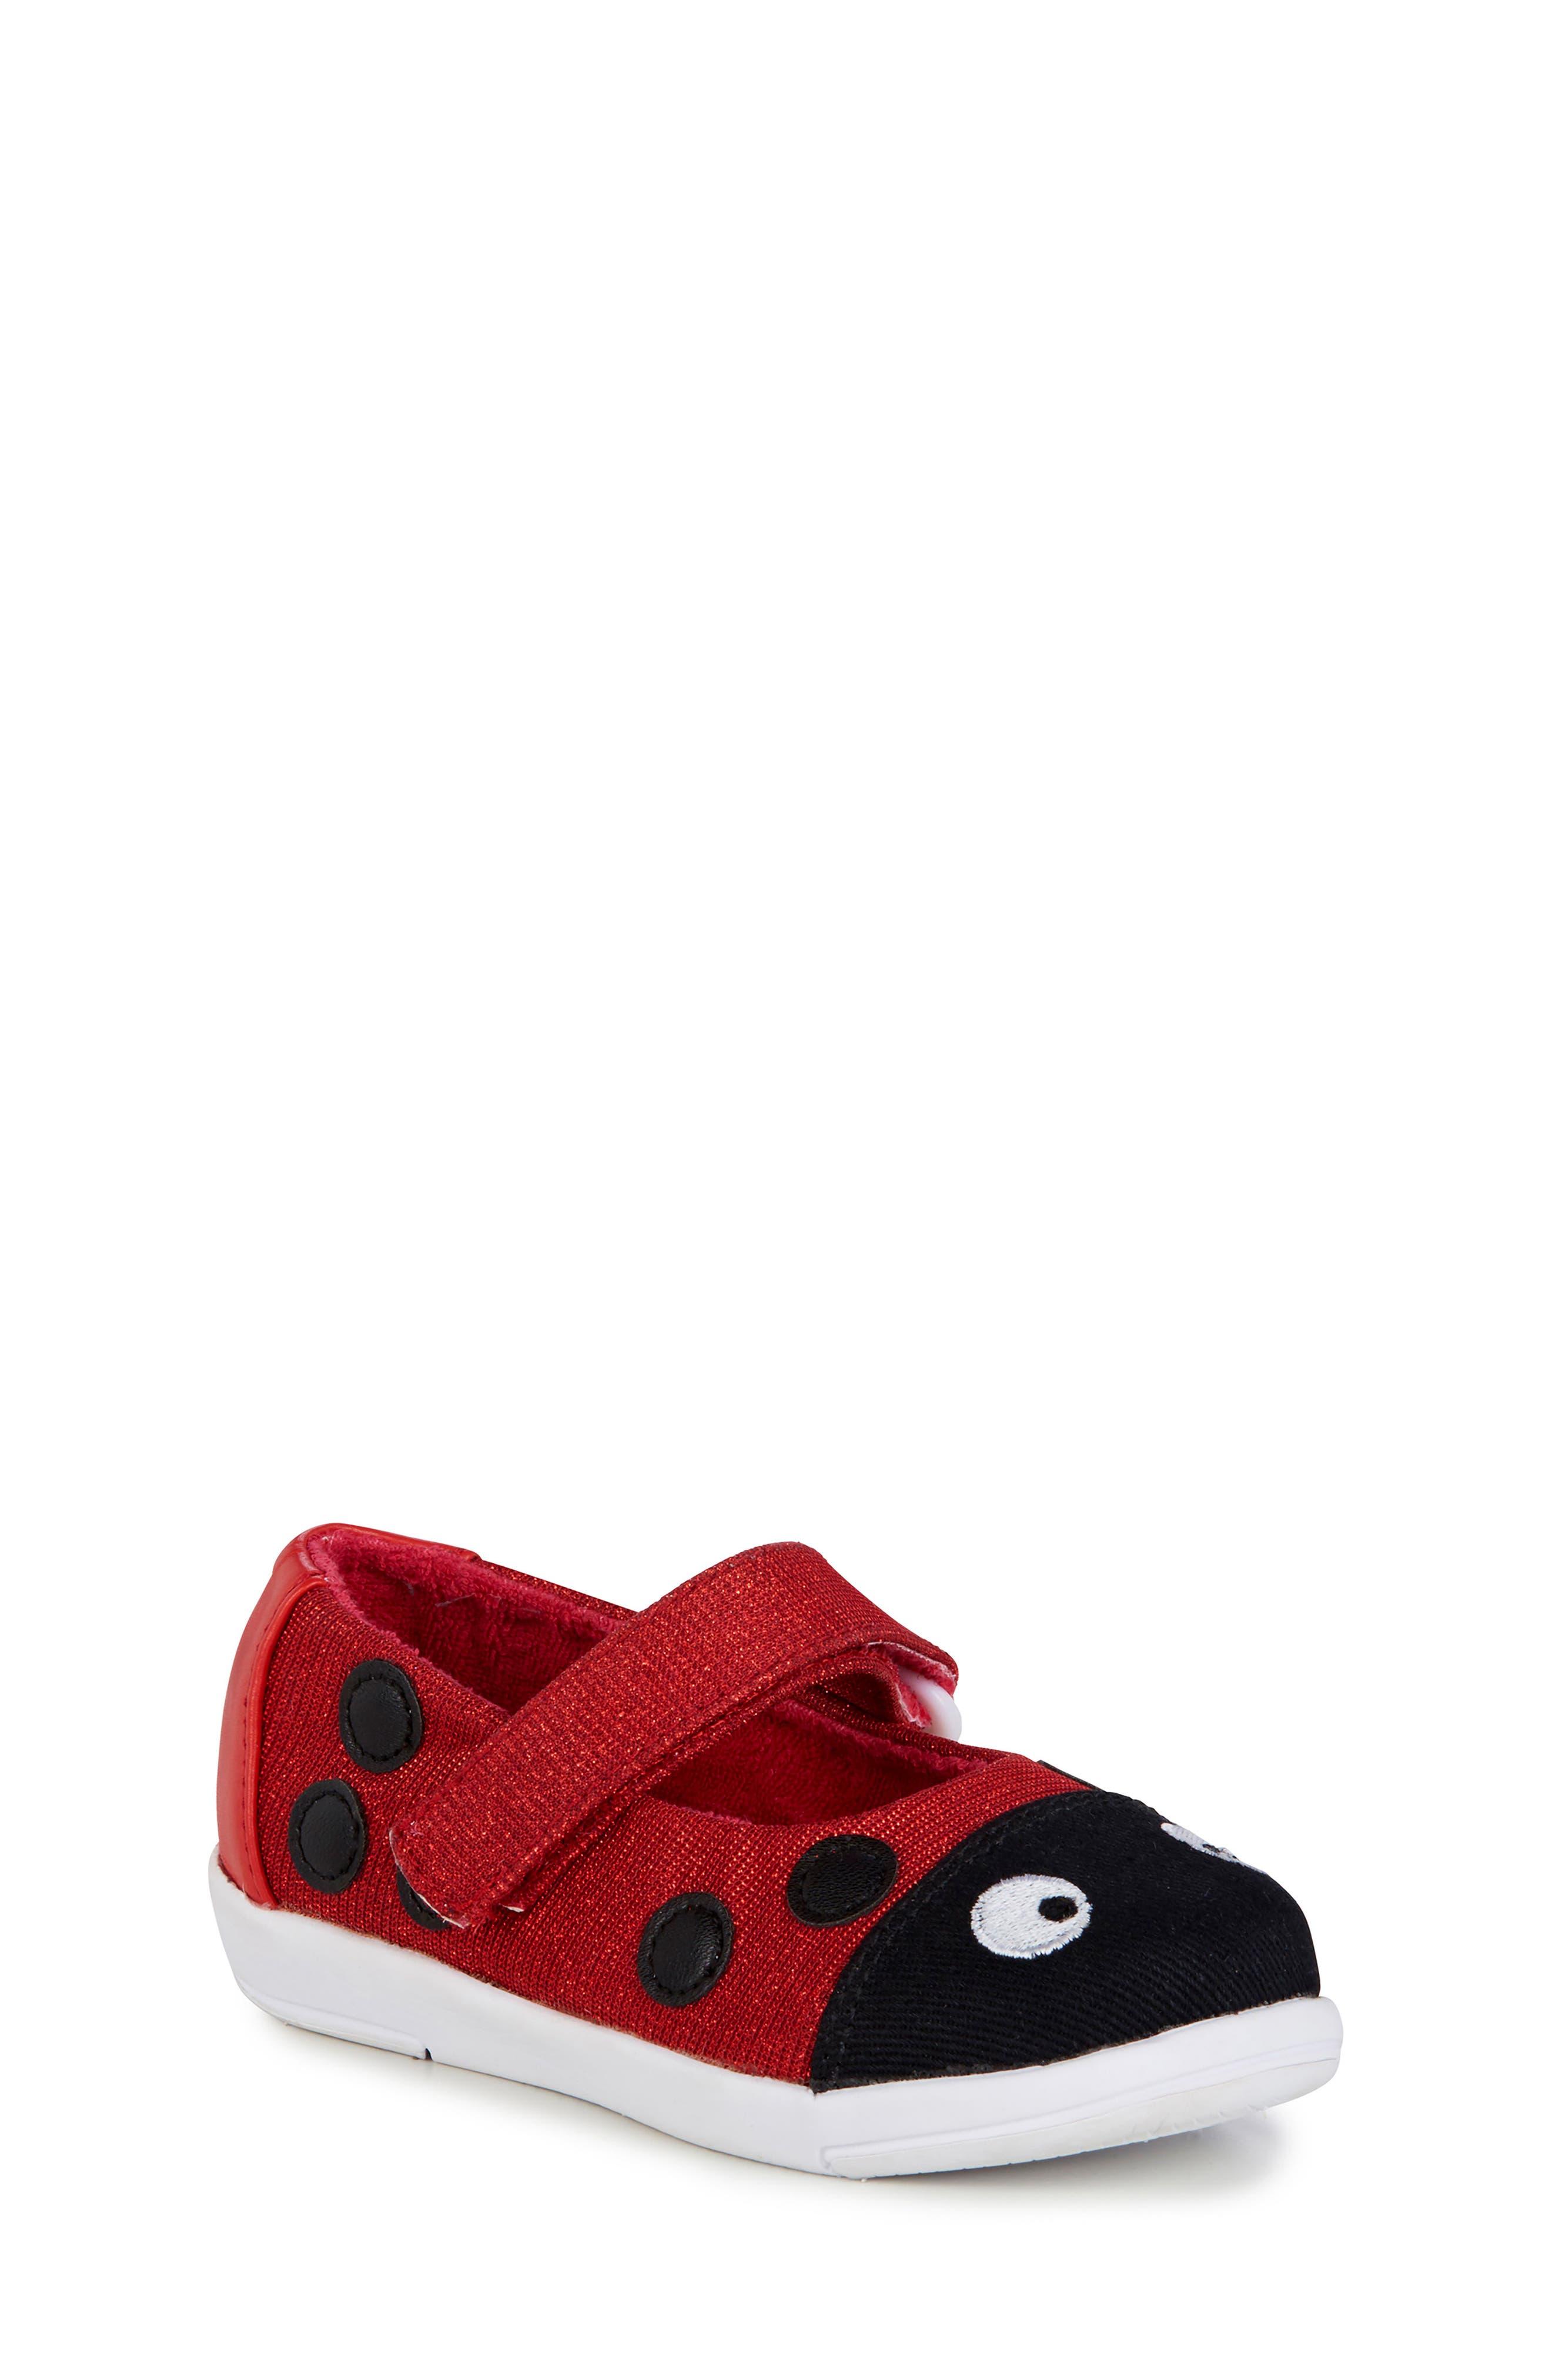 Ladybug Mary Jane,                             Main thumbnail 1, color,                             RED